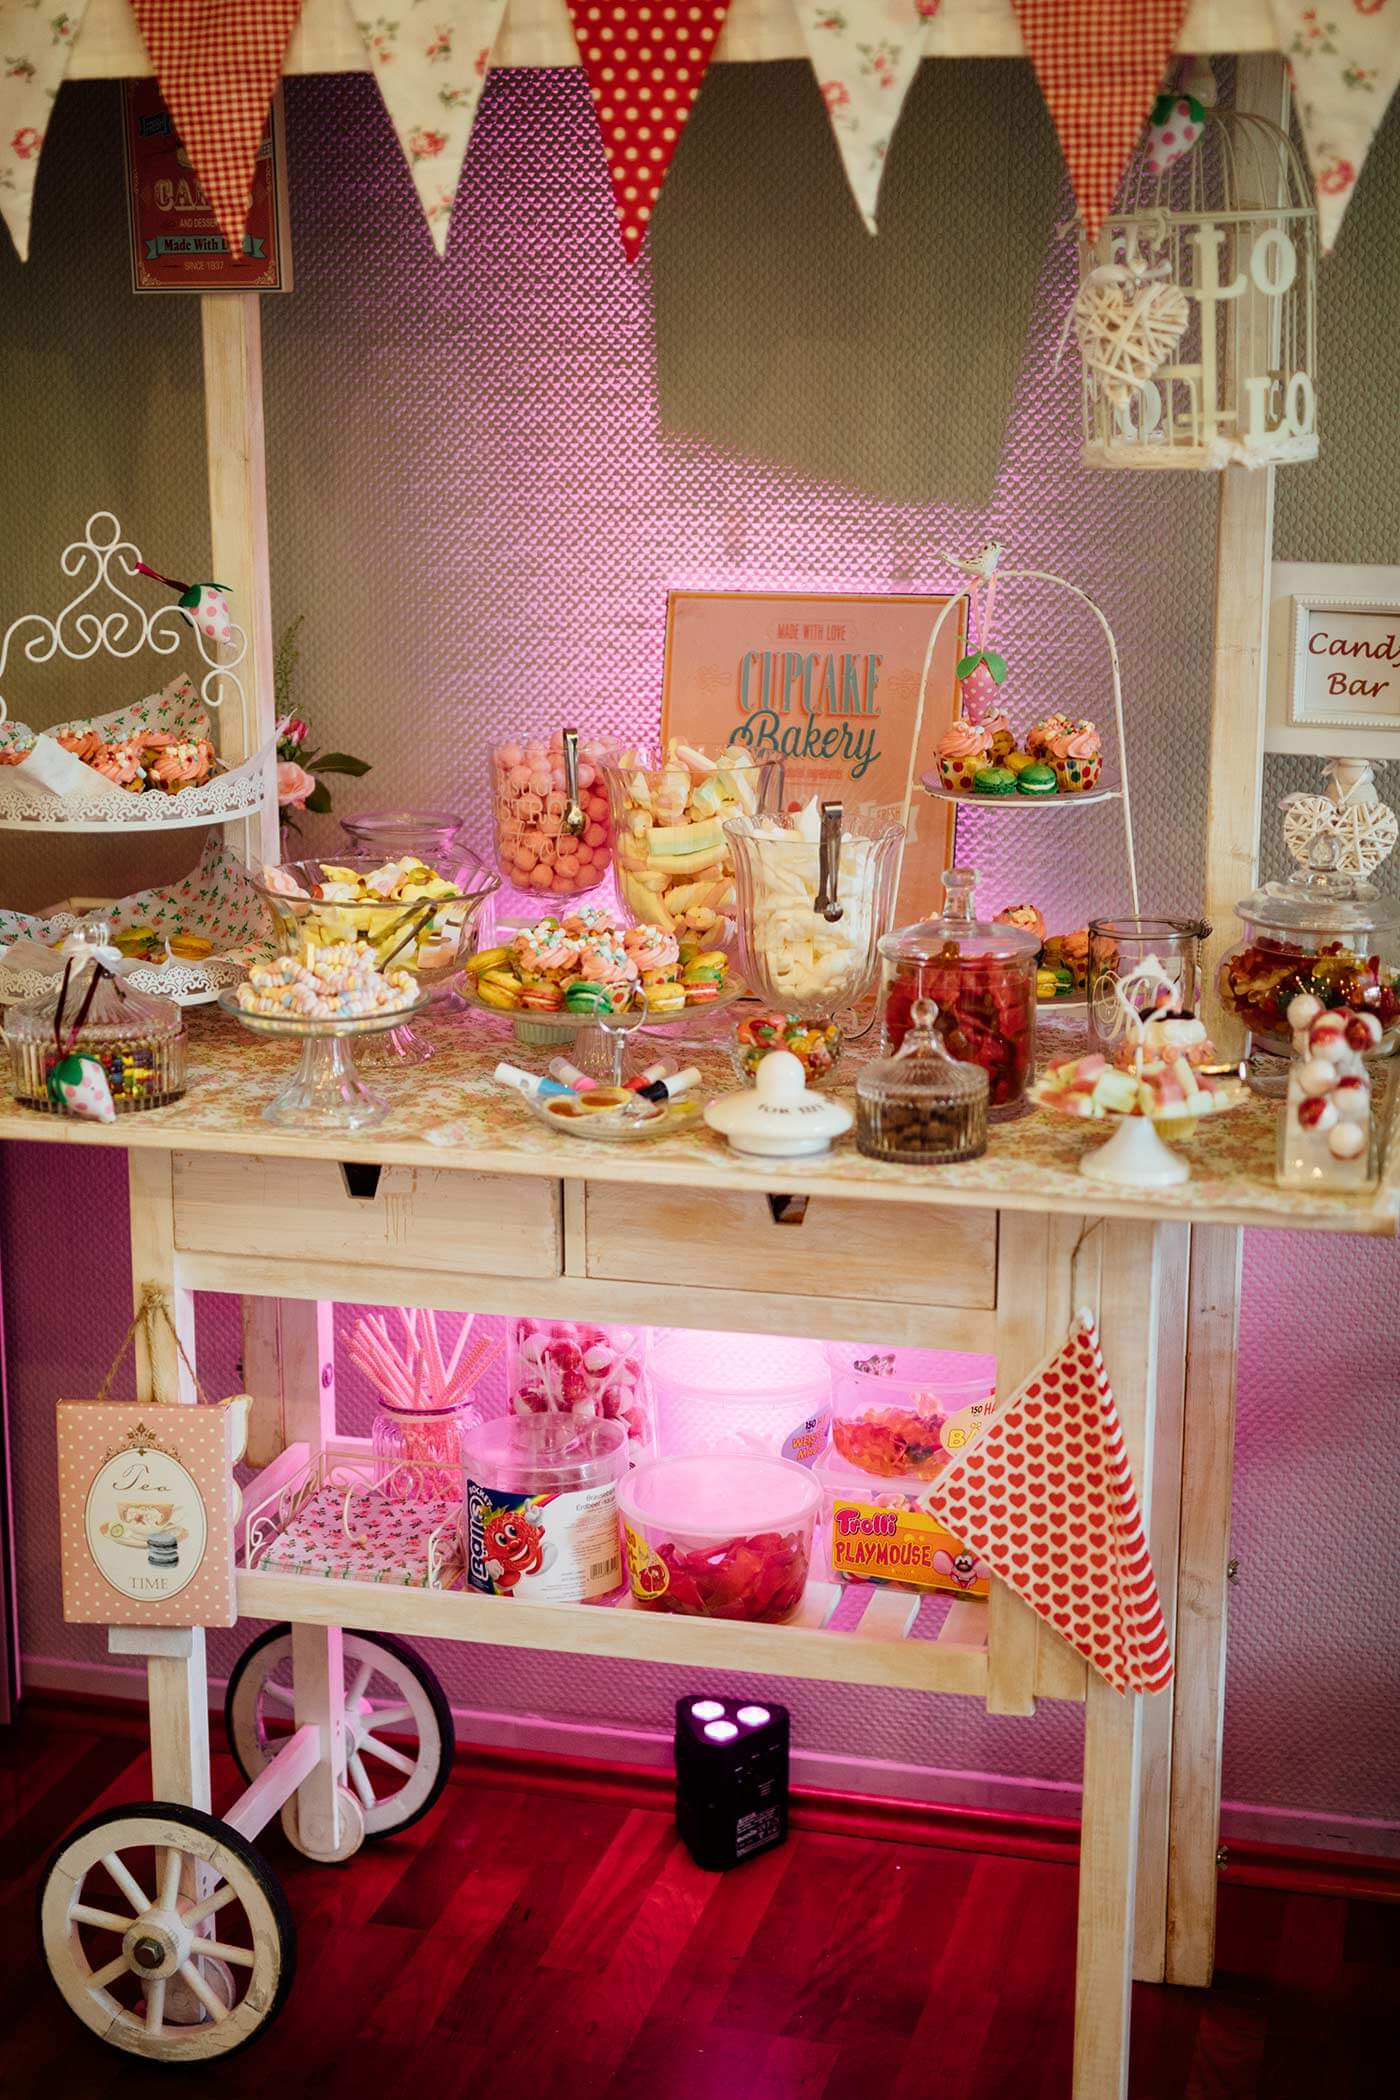 Candybar Wagen